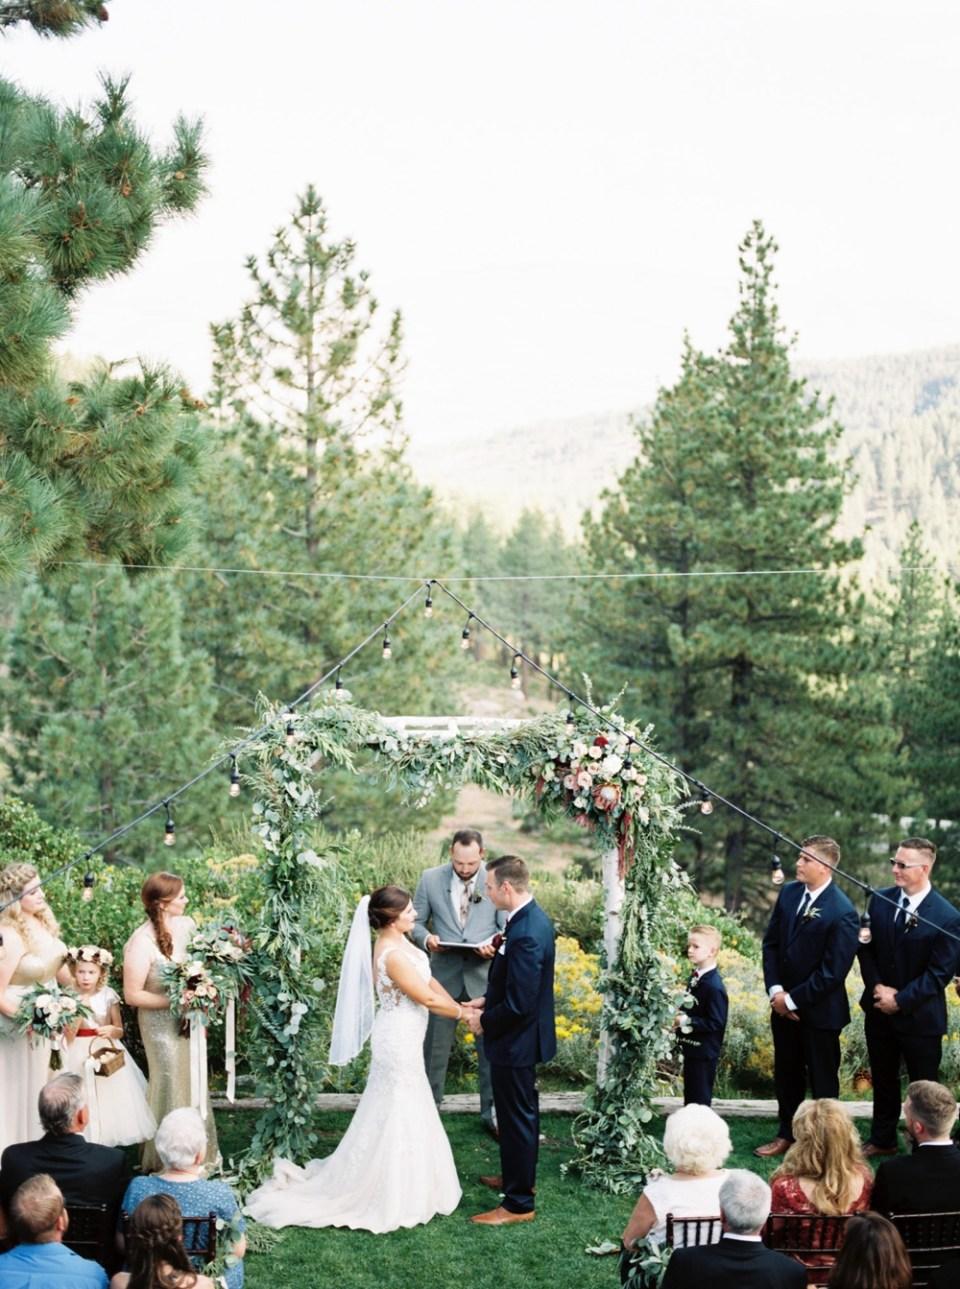 tannenbaum wedding, lake tahoe wedding venue, mountain wedding inspiration tannenbaum